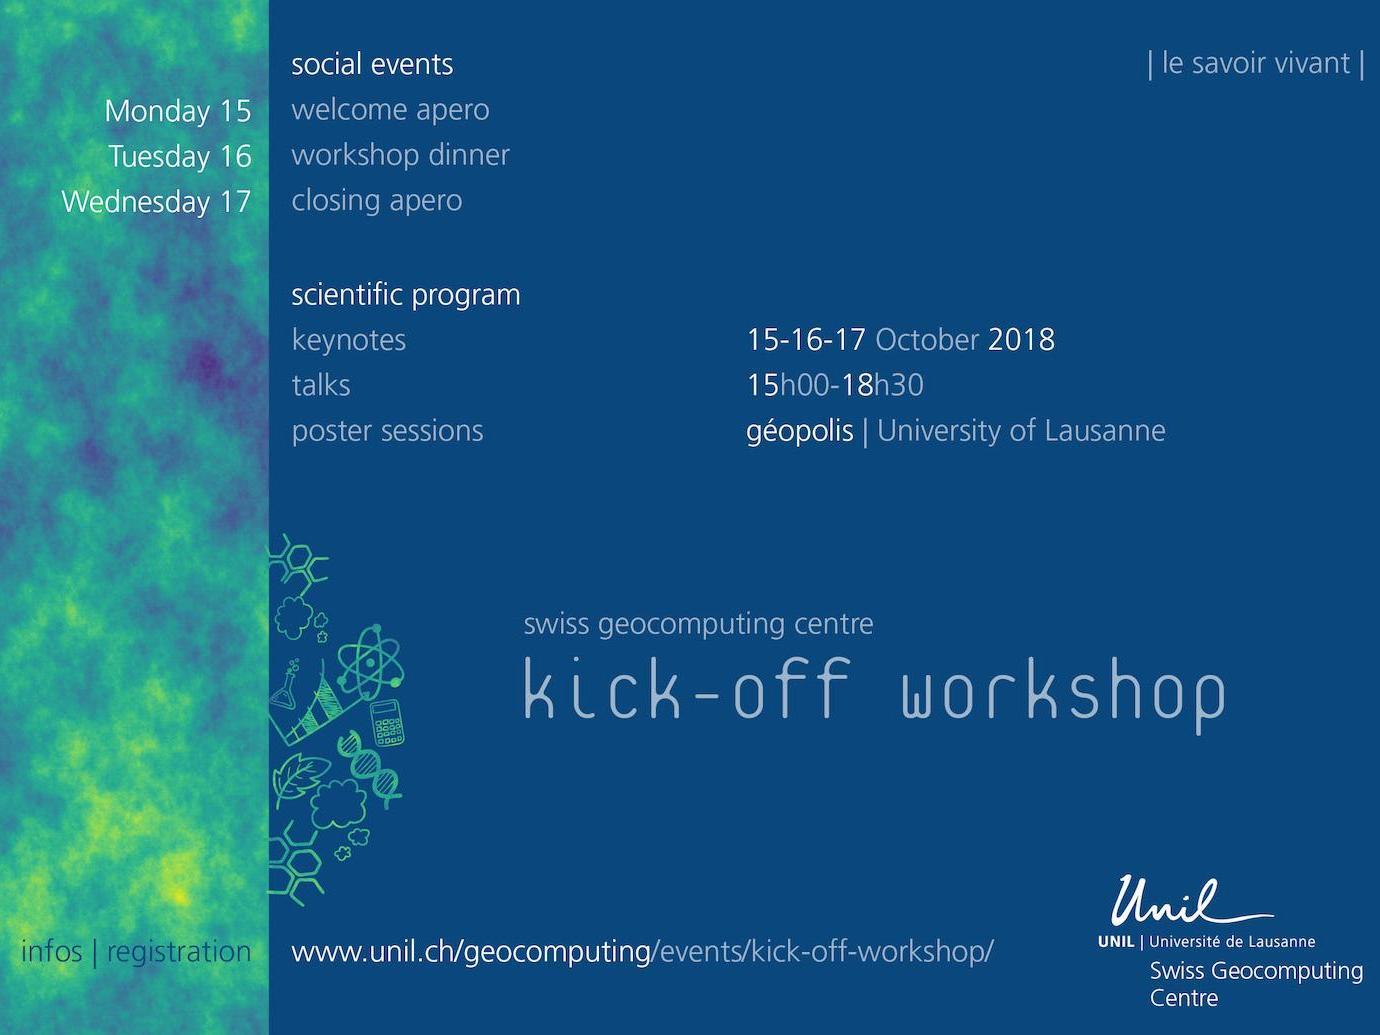 Swiss Geocomputing Centre kick-off workshop